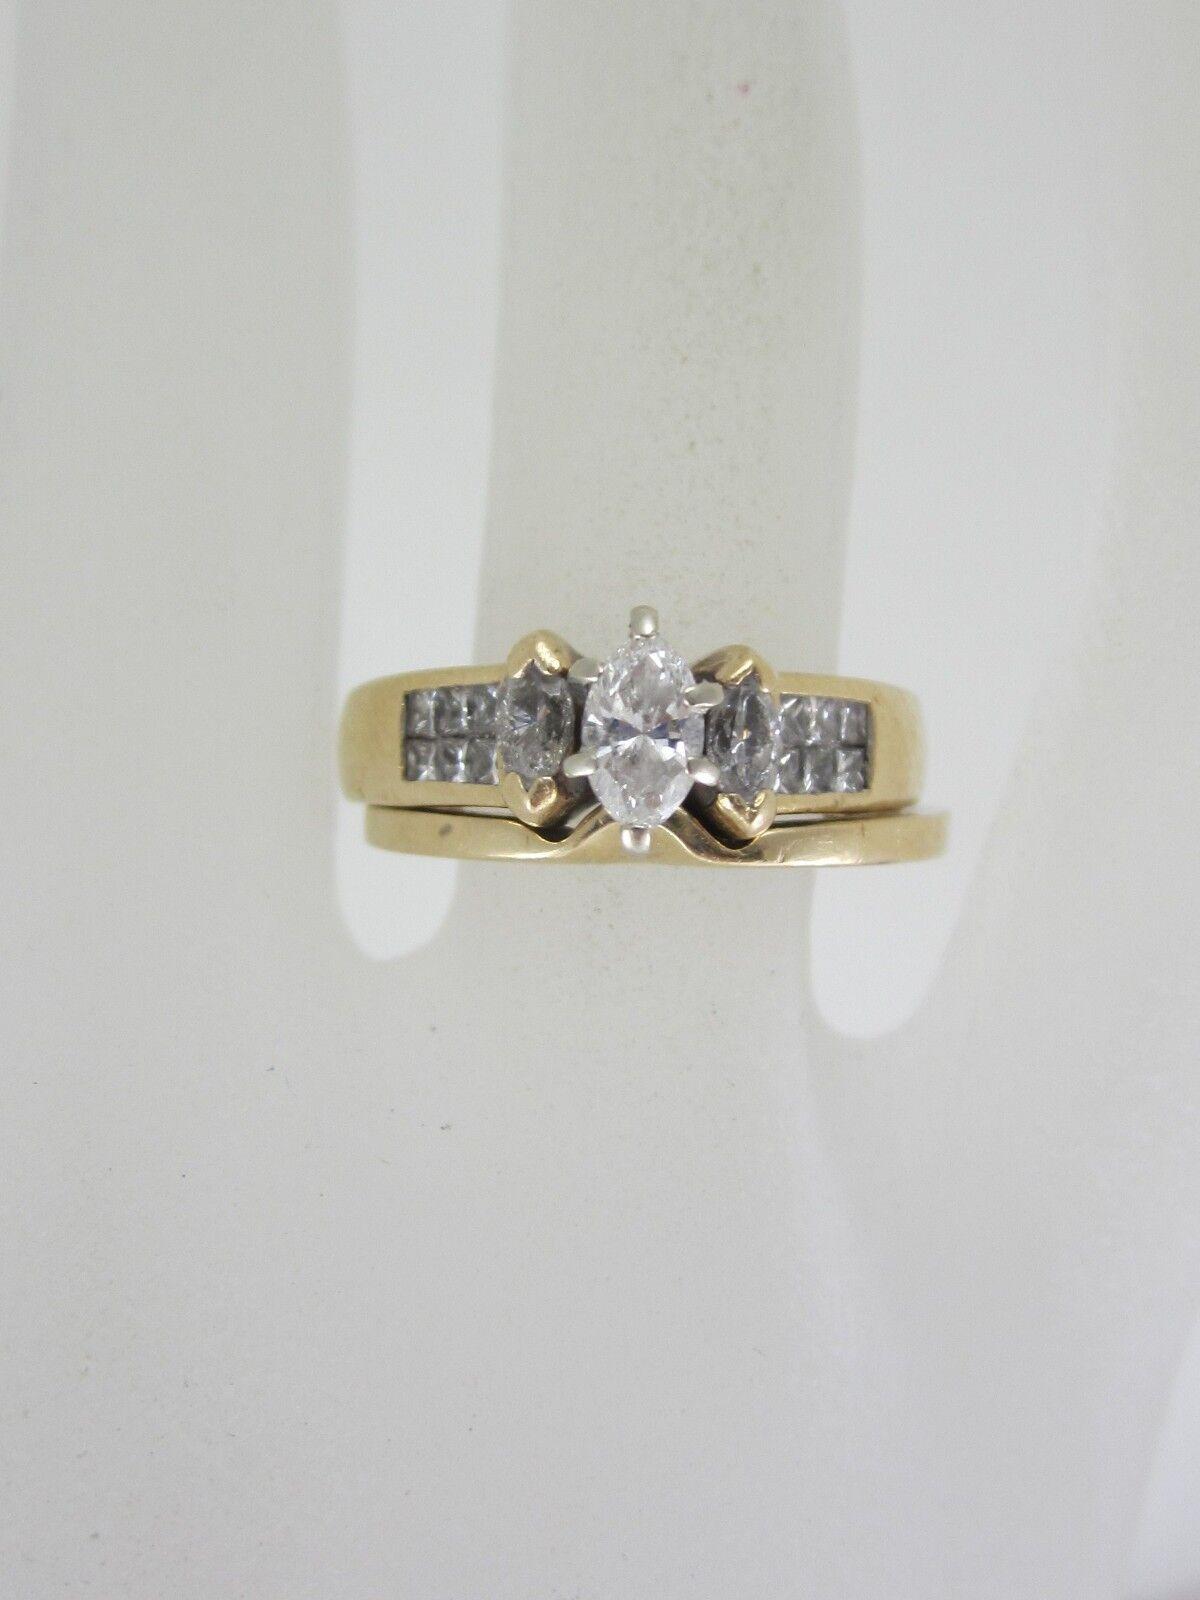 BEAUTIFUL LADIES 14K gold MARQUISE CUT DIAMOND WEDDING RING SET 7.4G